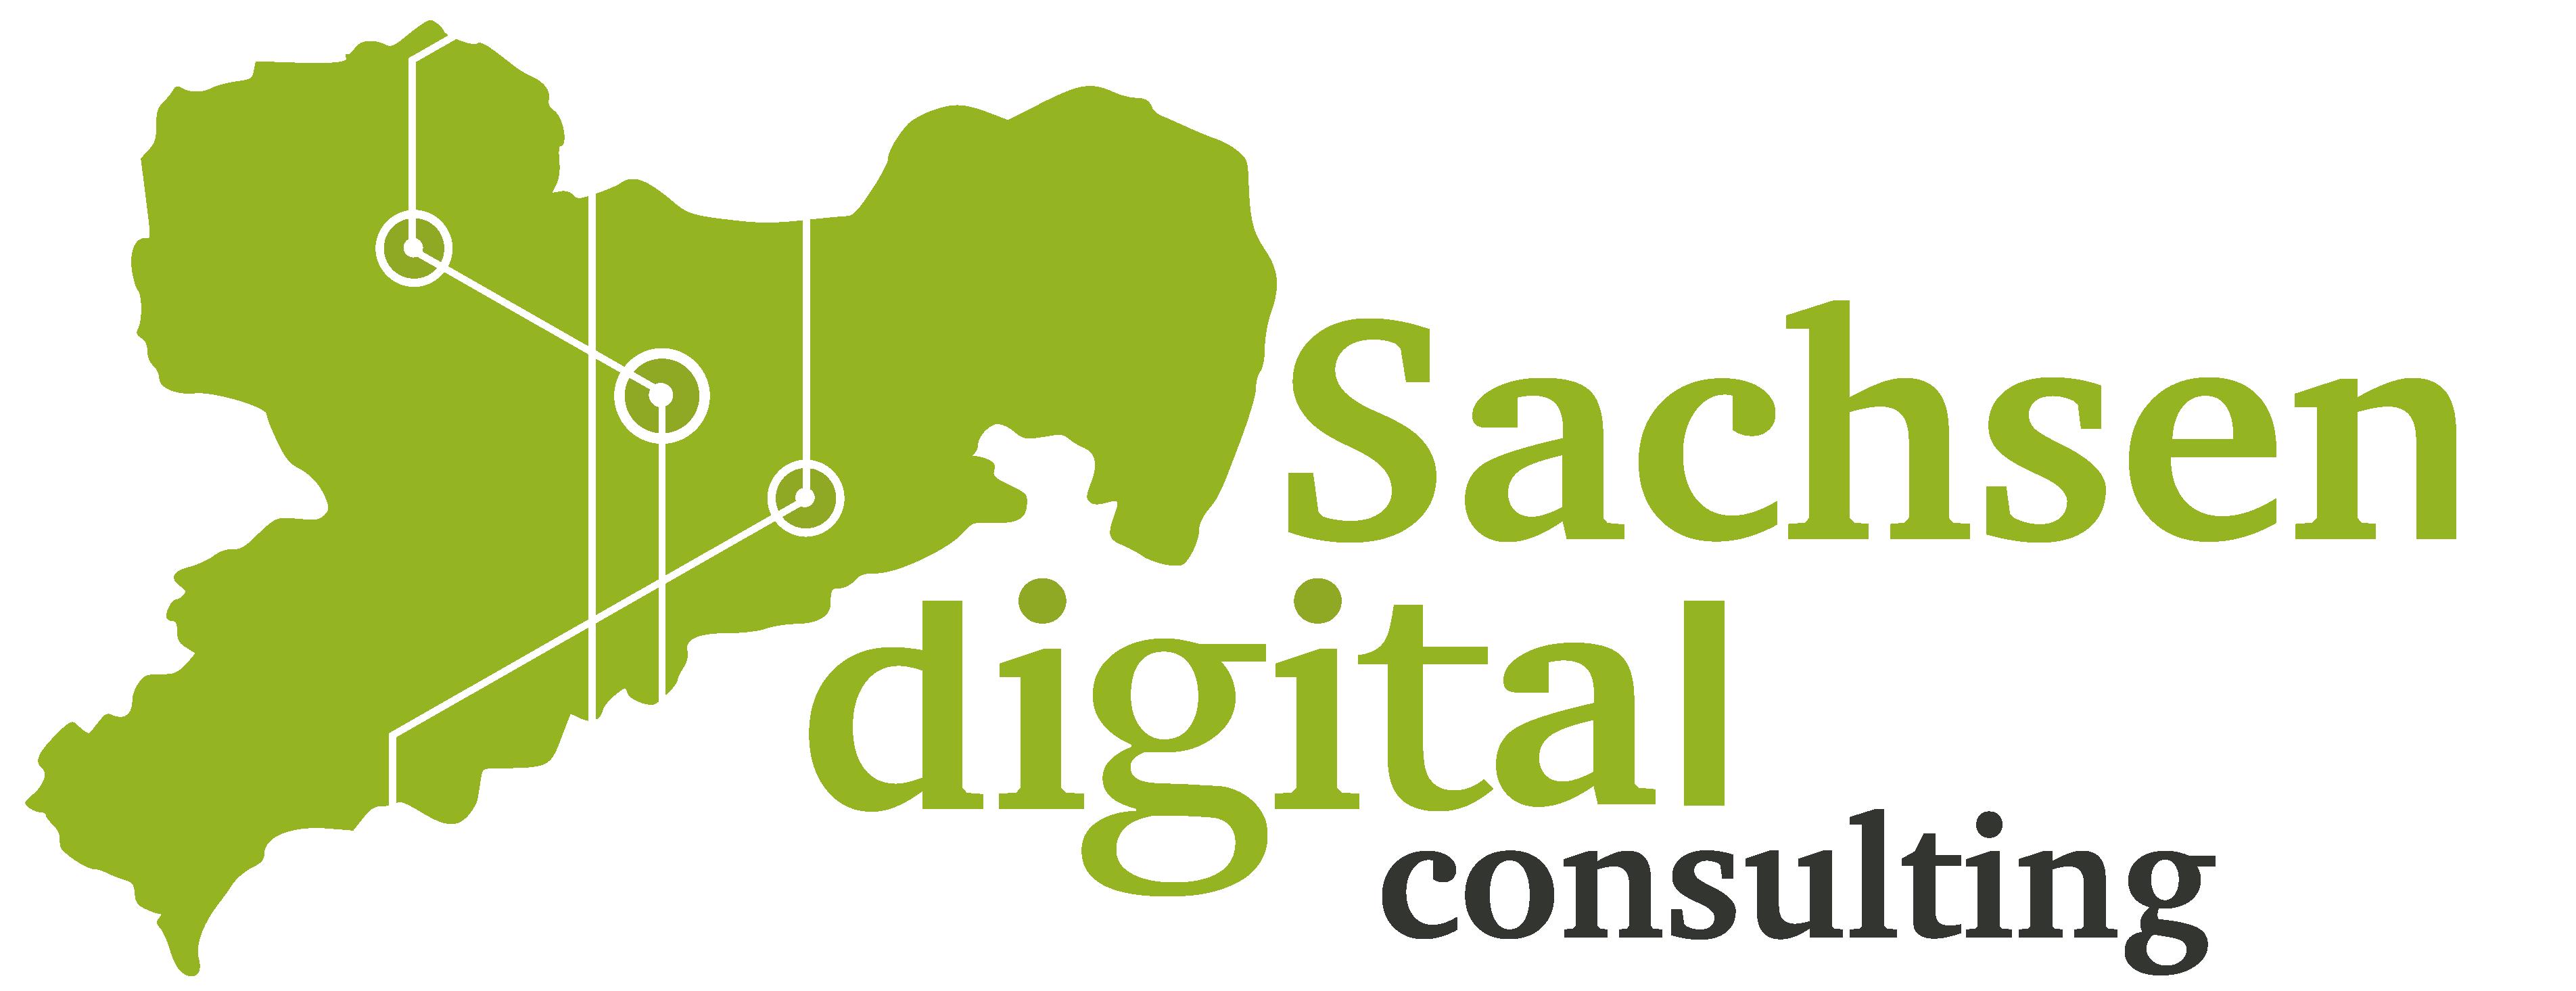 Sachsen Digital Consulting – Beratung, Planung, Digitalisierung